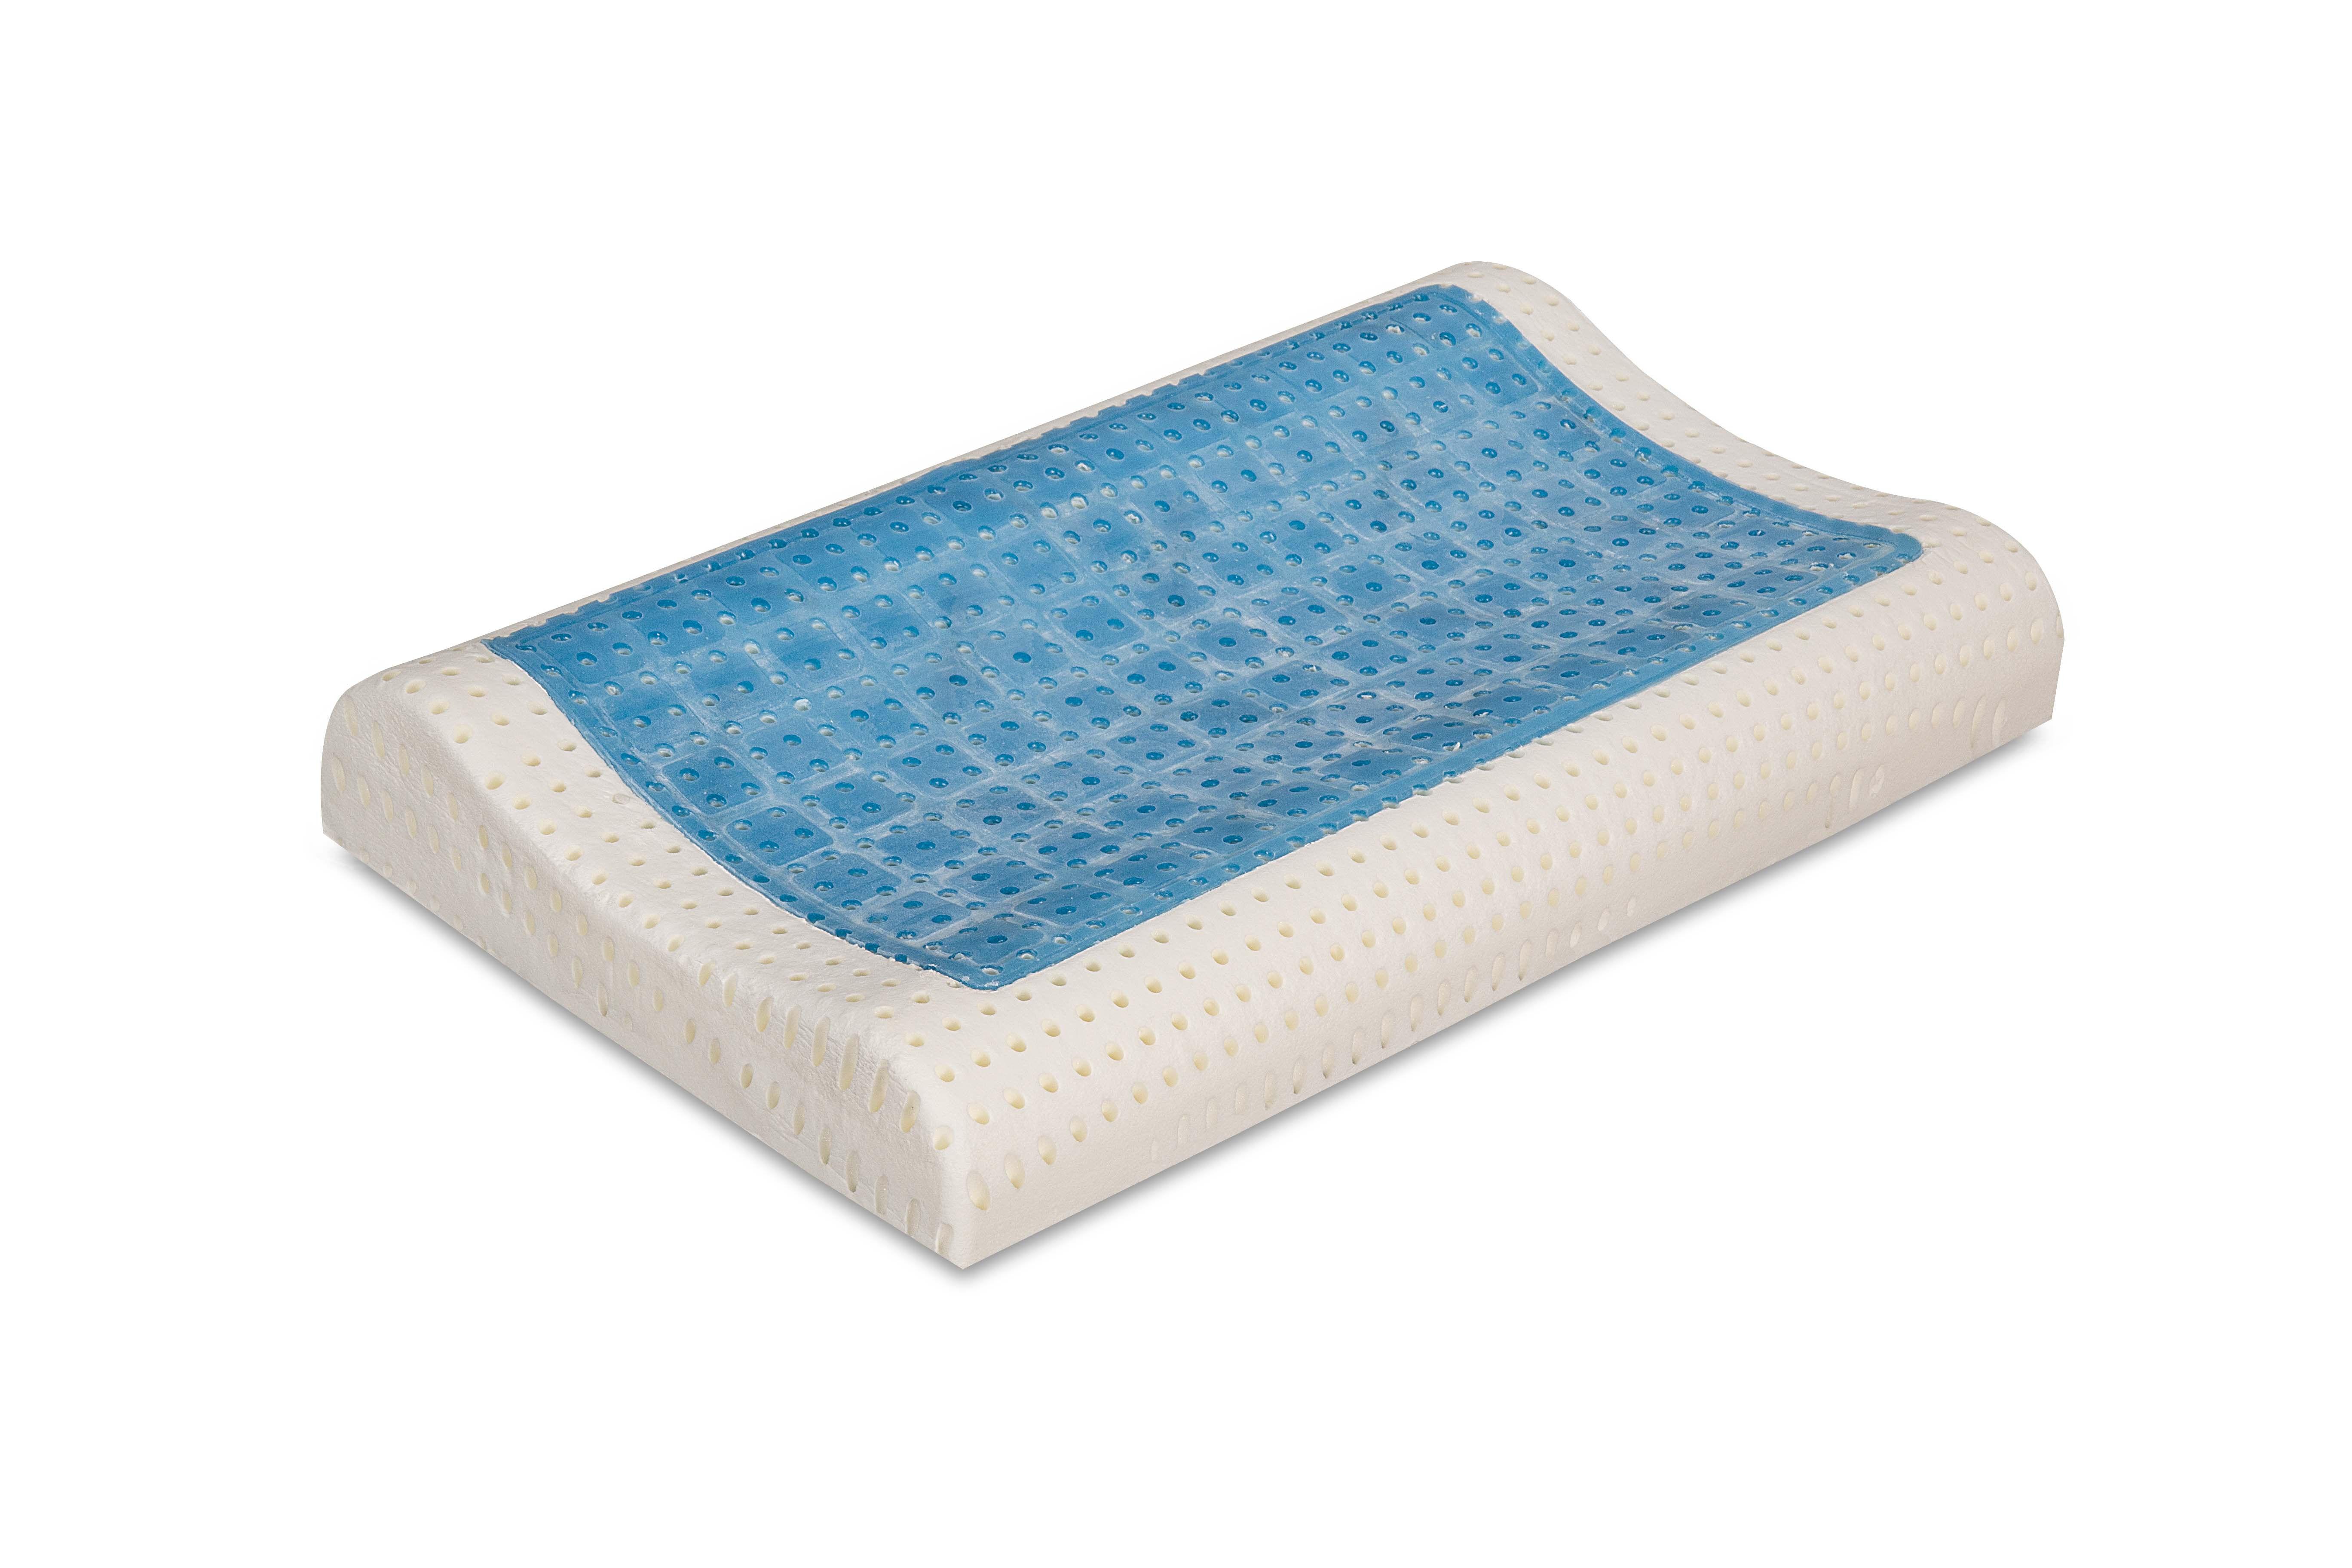 evergreenweb cuscino cervicale memory gel tessuto coolmax